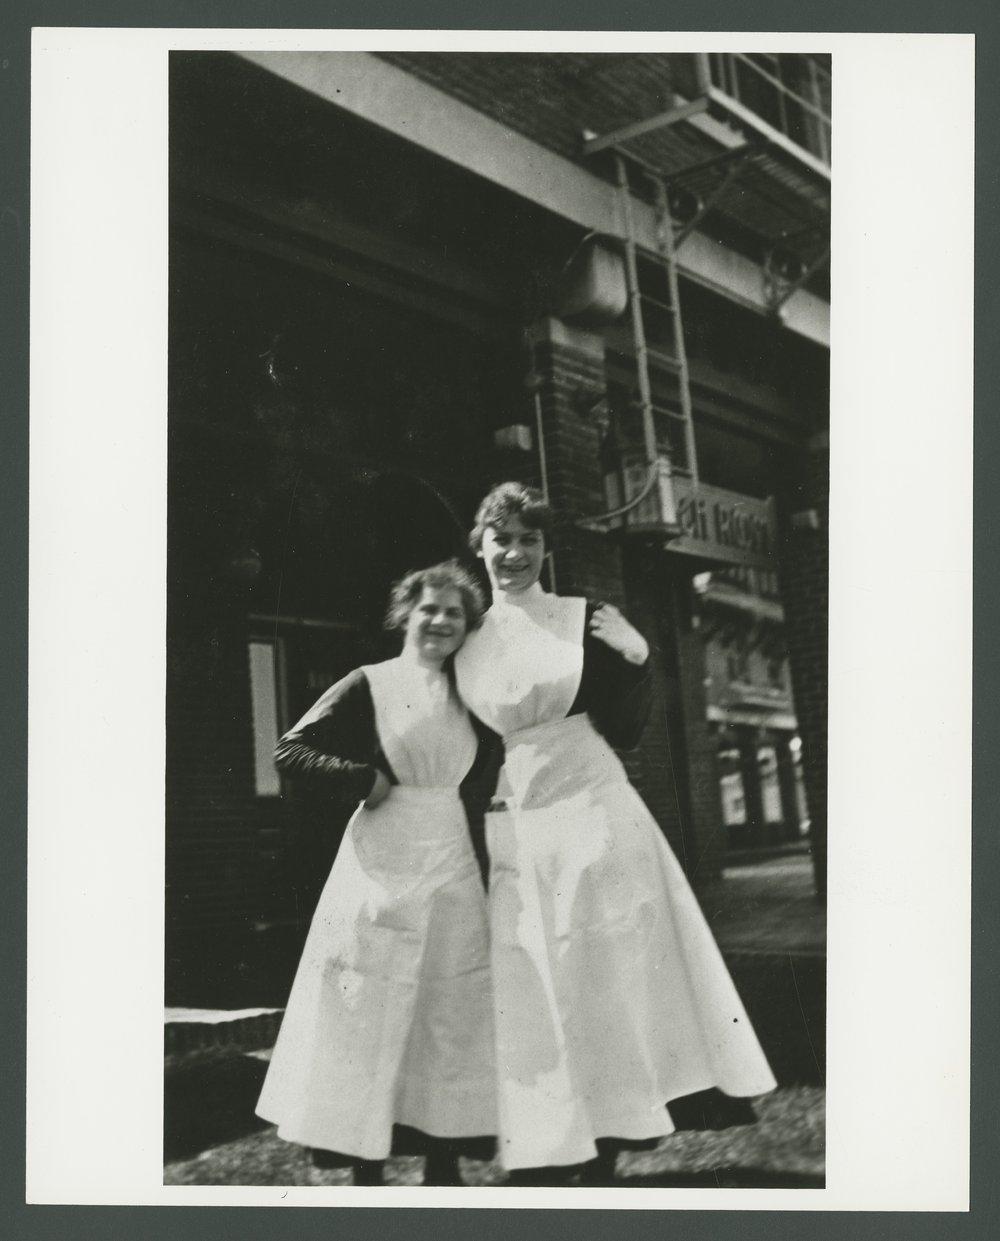 Harvey Girls, Hutchinson, Kansas - 1